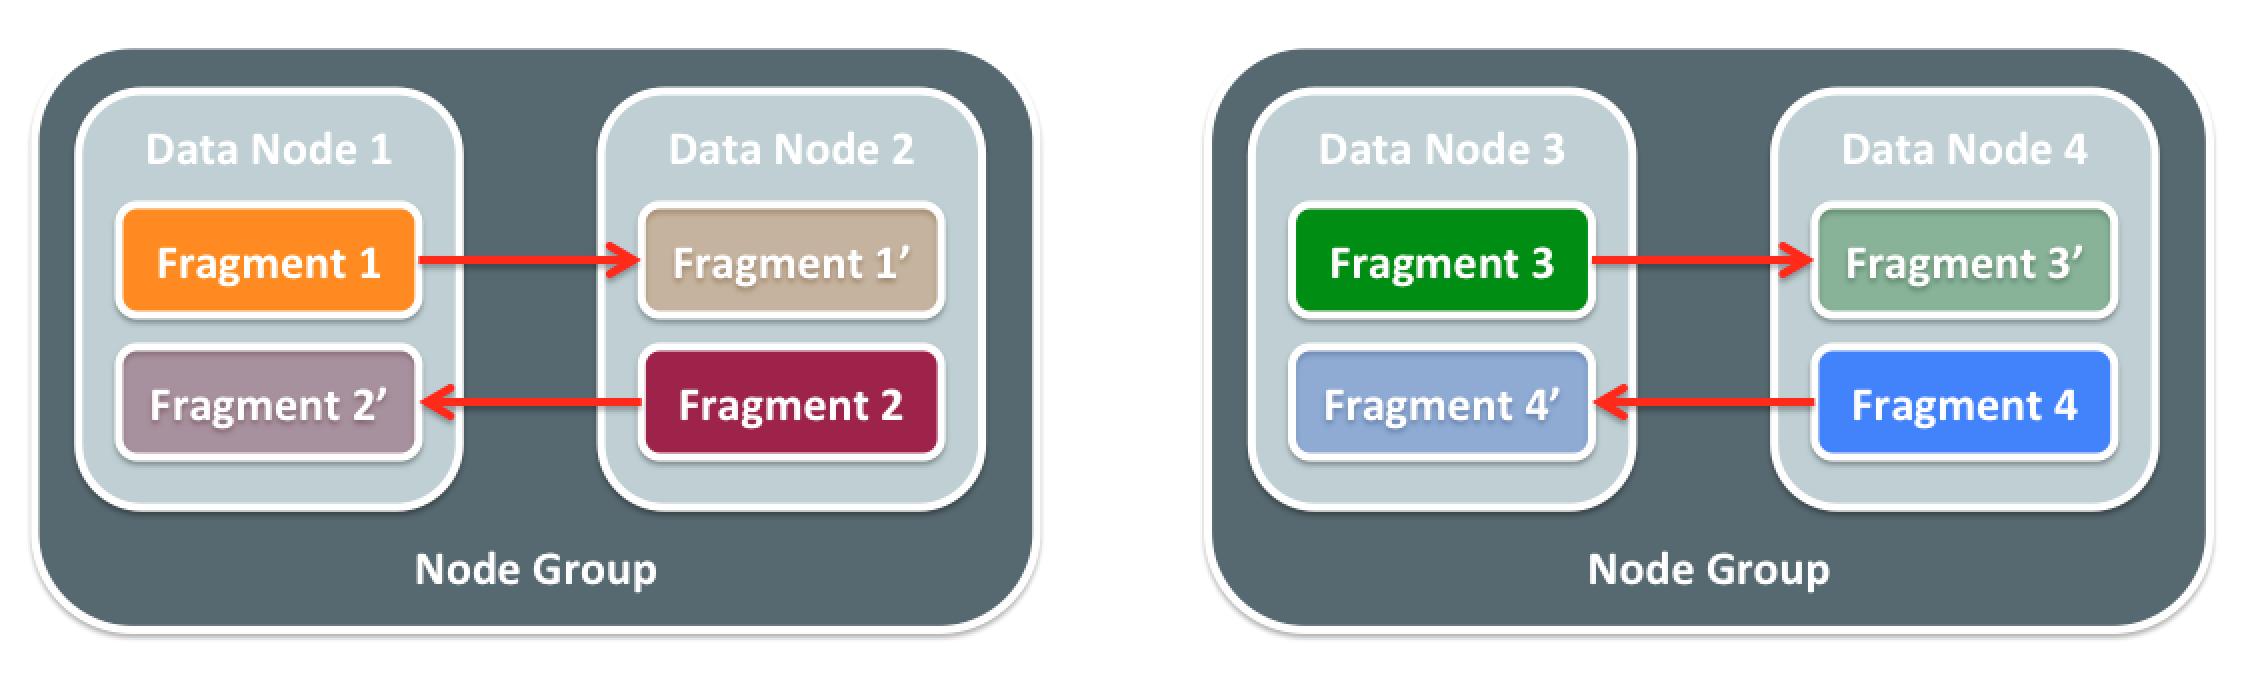 Oracle专家谈MySQL Cluster如何支持200M的QPS